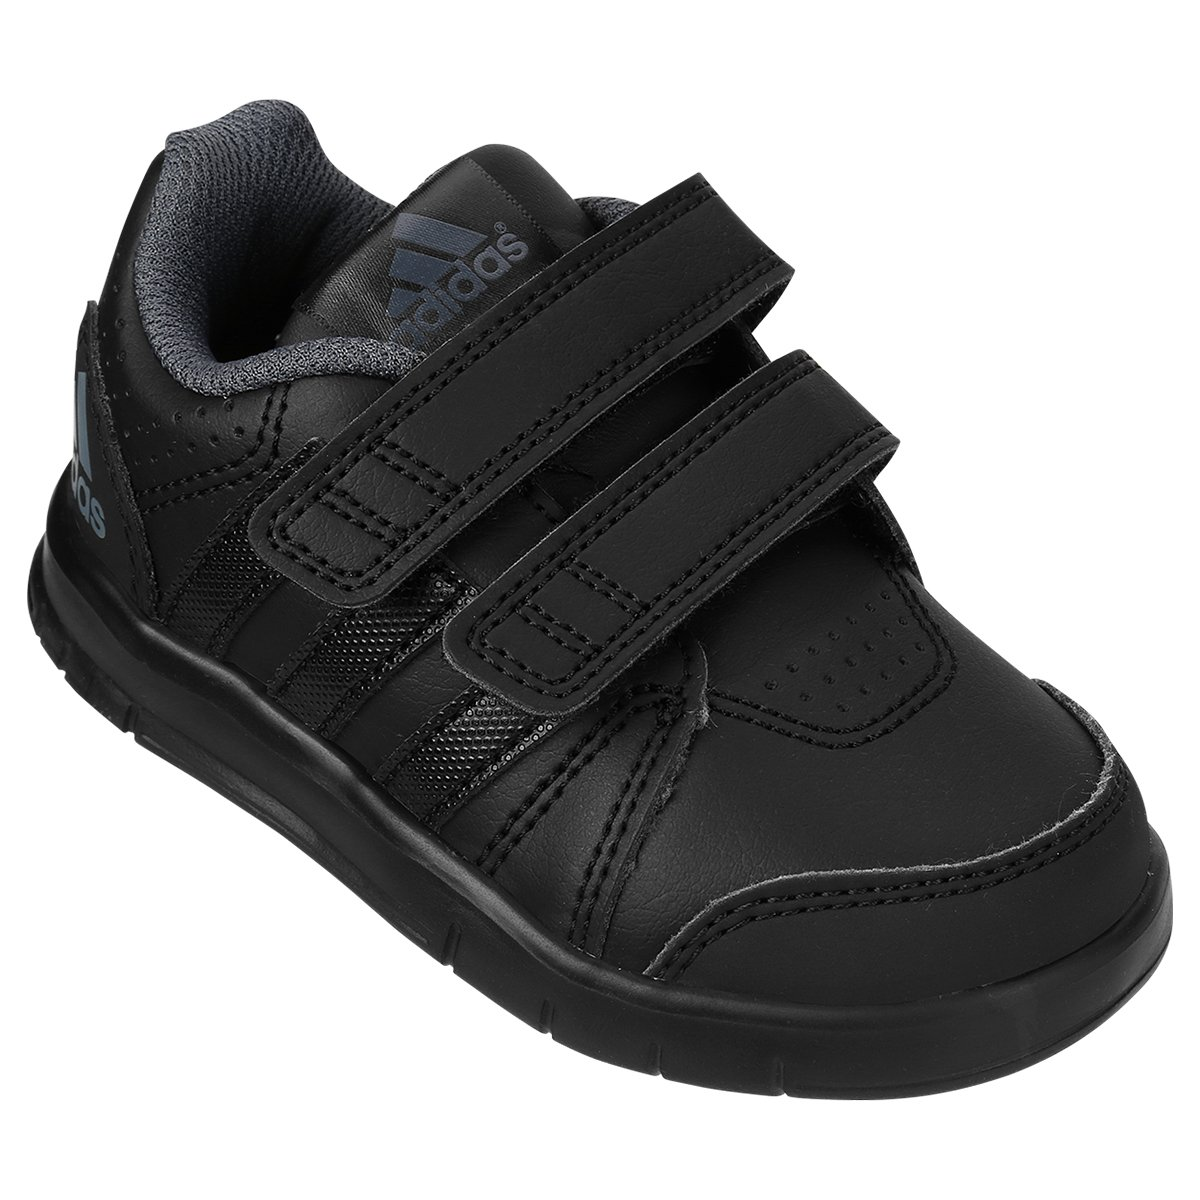 d6faf89b6f2 Tênis Adidas Lk Trainer Cf I Synth Infantil